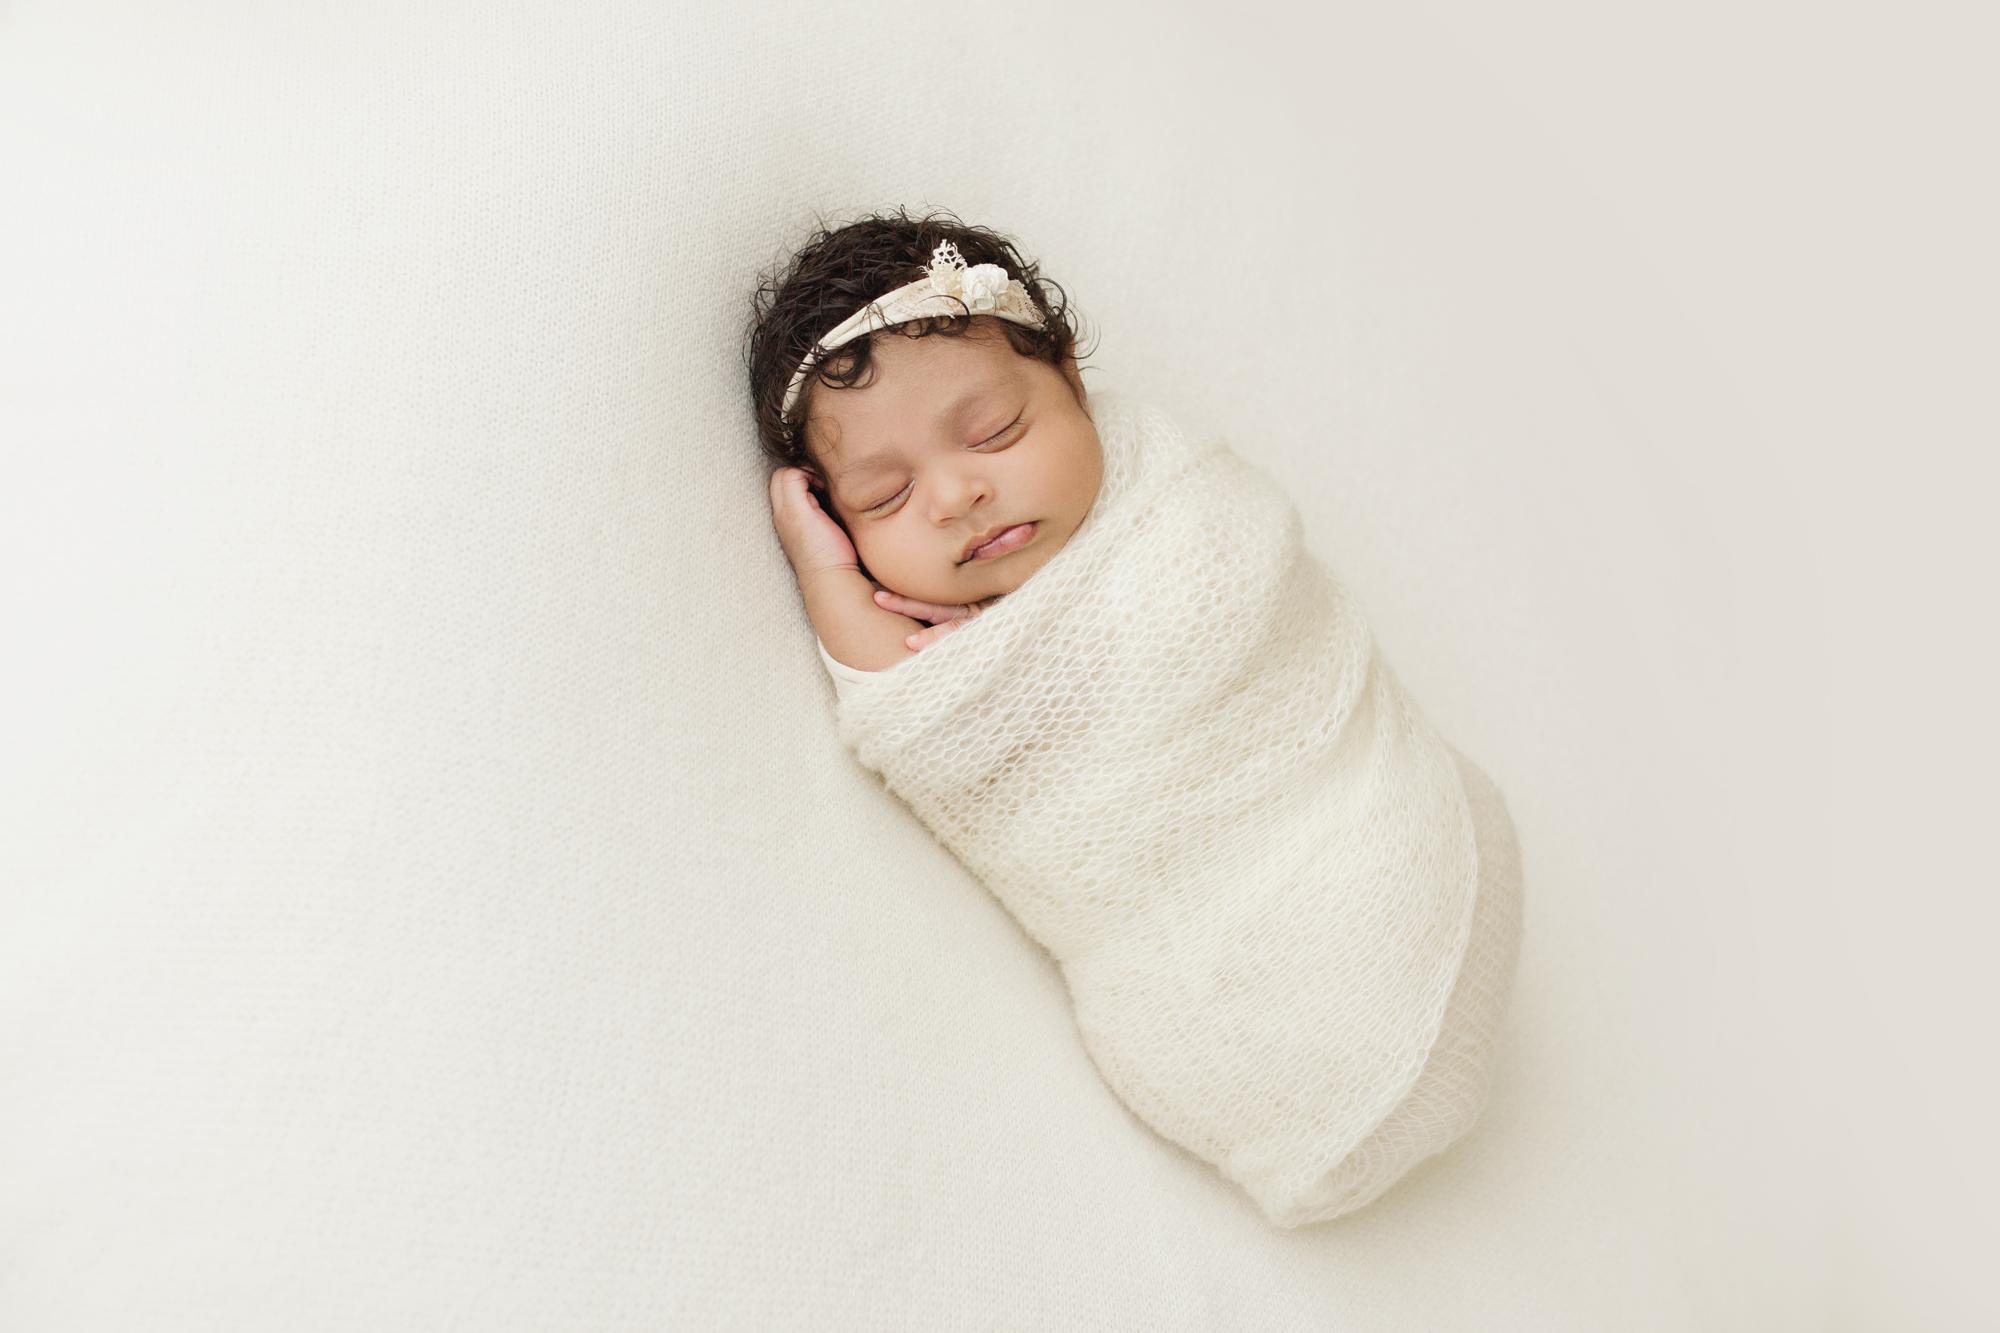 oklahoma-city-newborn-photographers.jpg